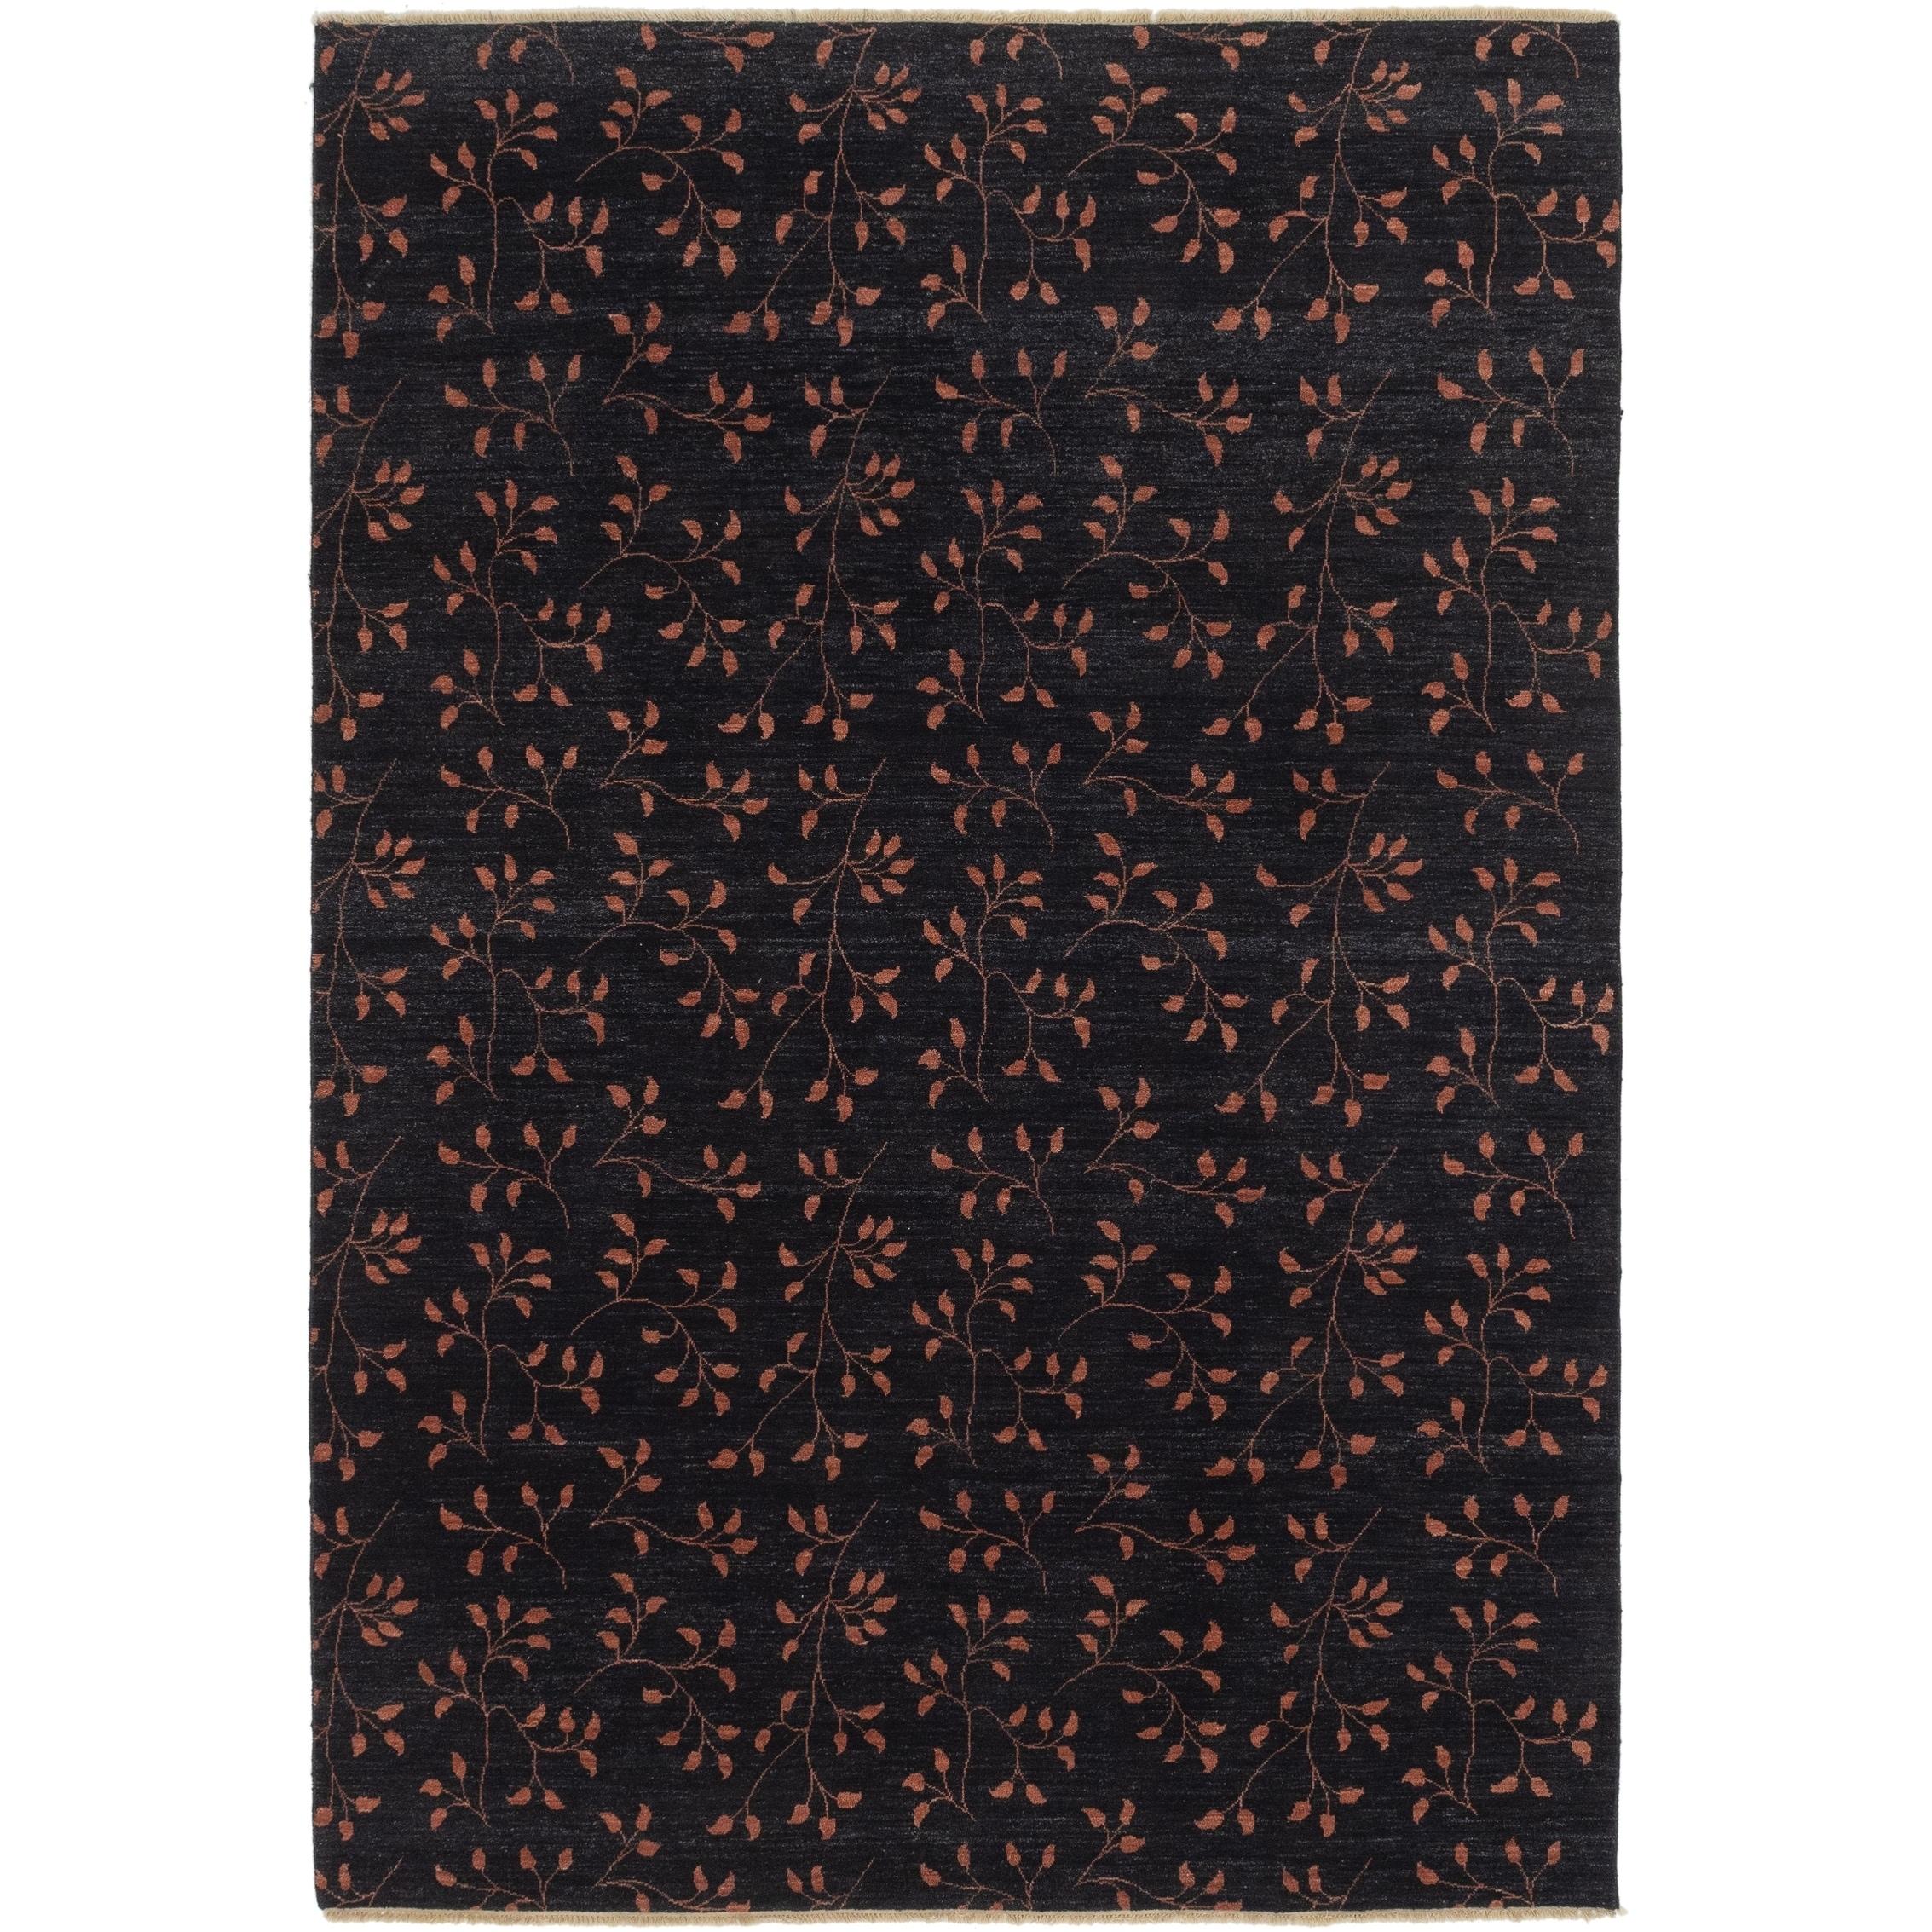 Hand Knotted Kashkuli Gabbeh Wool Area Rug - 6 8 x 9 9 (Black - 6 8 x 9 9)